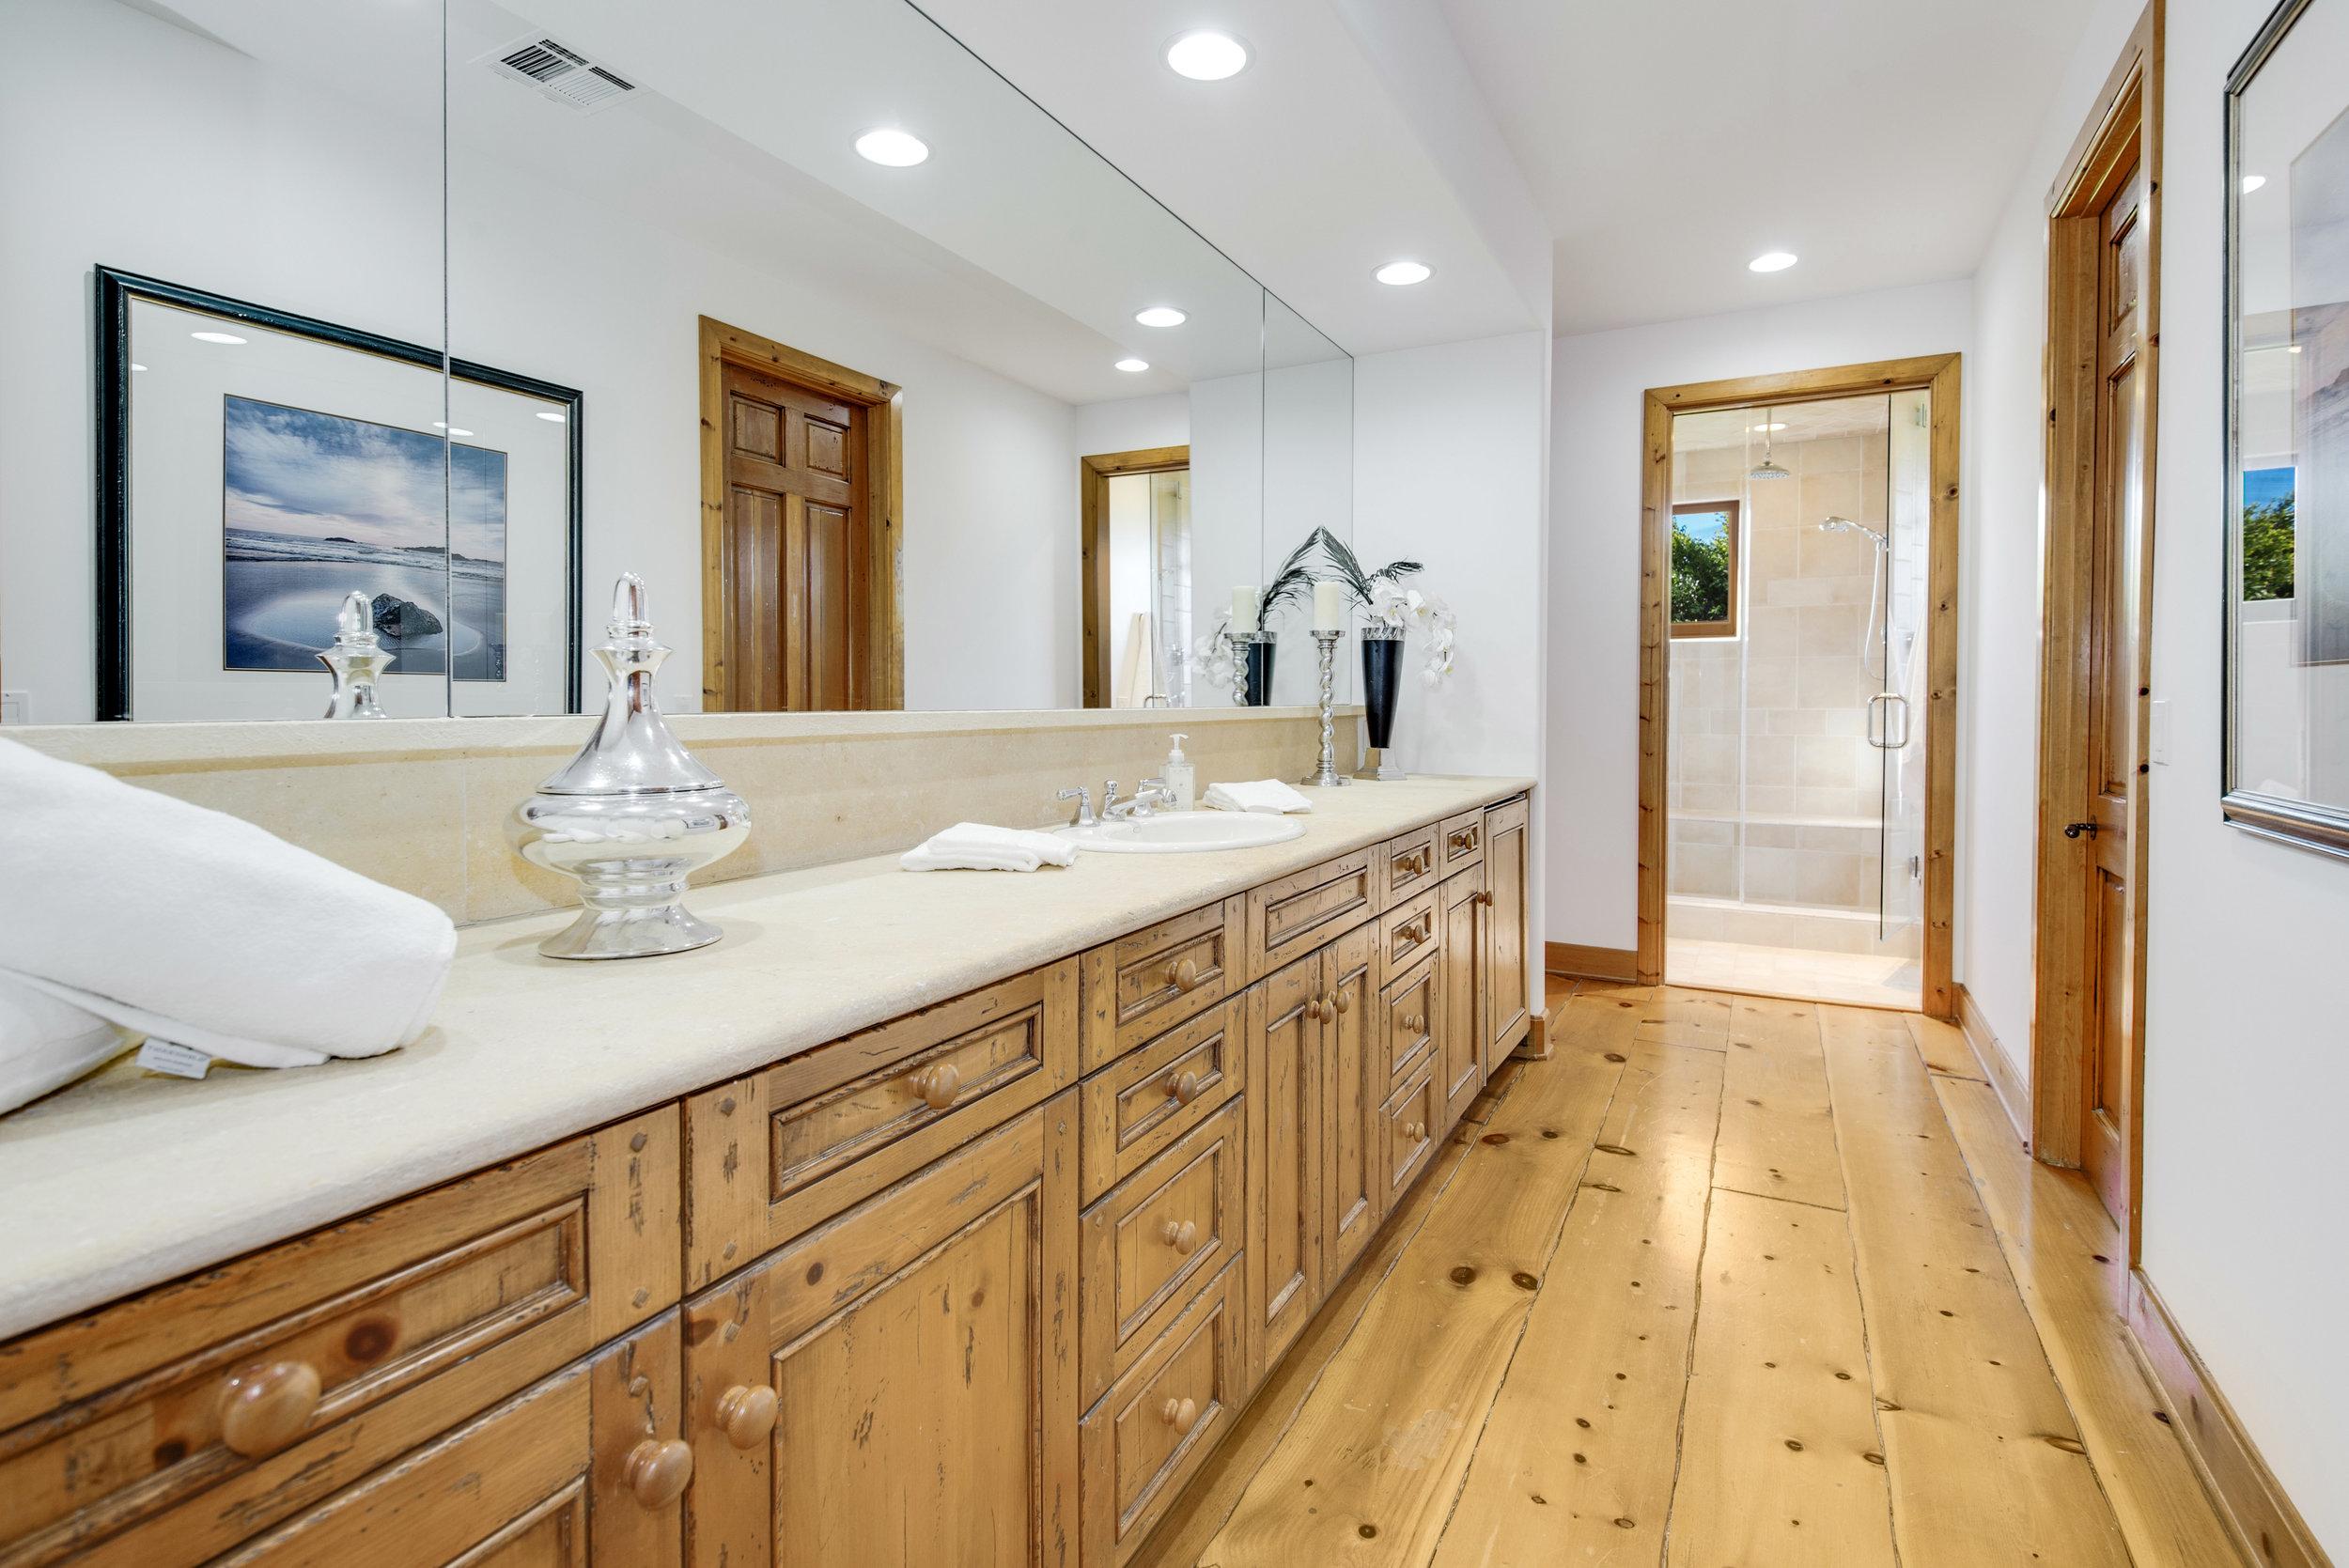 018 Bathroom 27475 Latigo Bay View Drive For Sale Lease The Malibu Life Team Luxury Real Estate.jpg